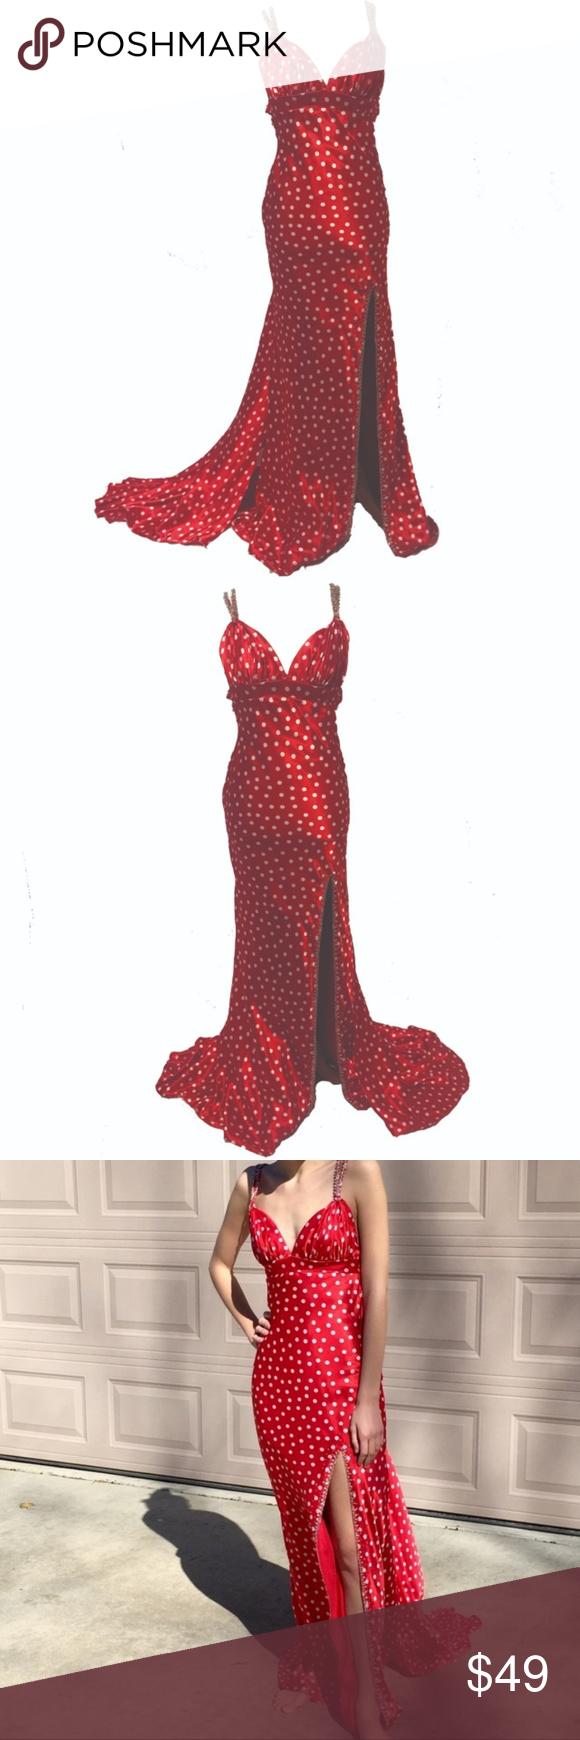 Red Polka Dot Prom Dress